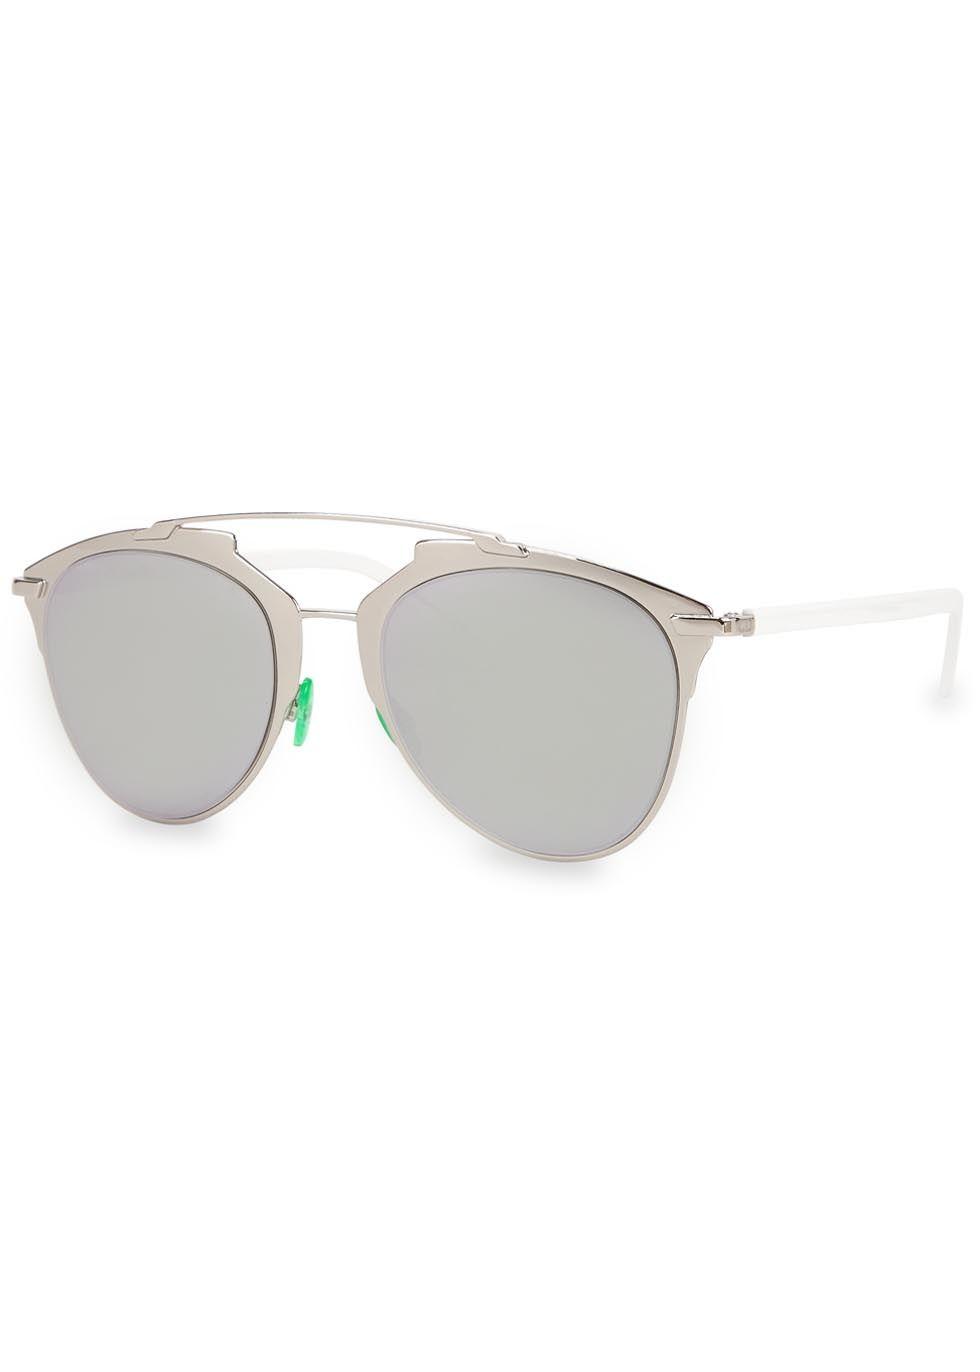 29b97a3747c5 Christian Dior silver tone metal sunglasses Grey mirrored lenses ...